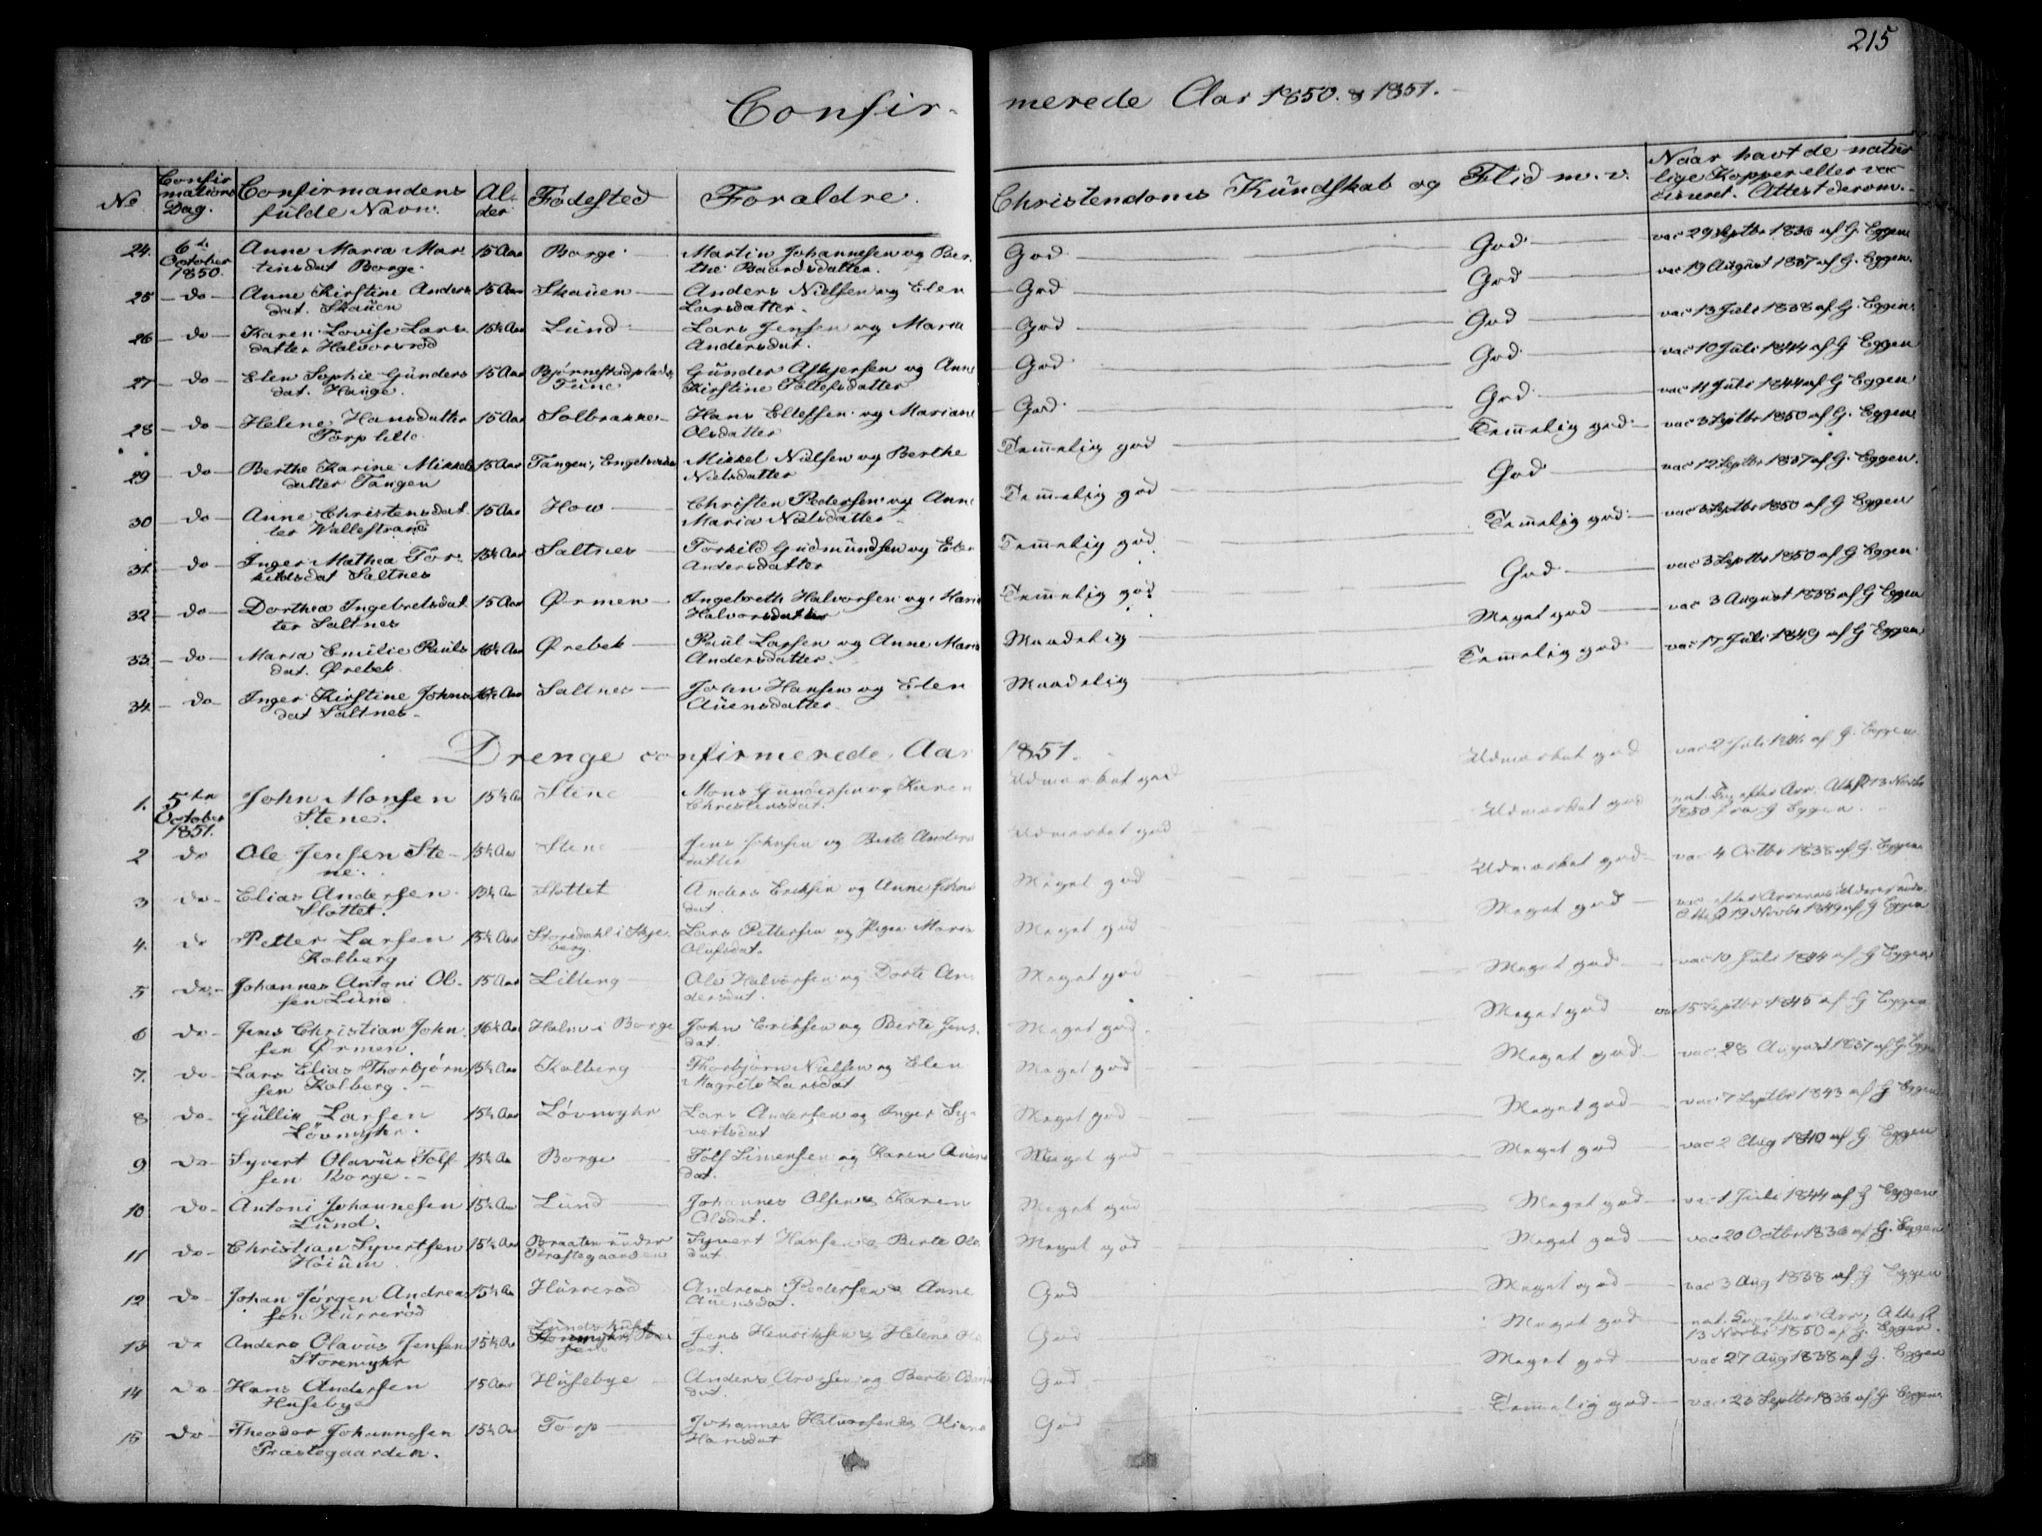 SAO, Onsøy prestekontor Kirkebøker, F/Fa/L0003: Ministerialbok nr. I 3, 1841-1860, s. 215